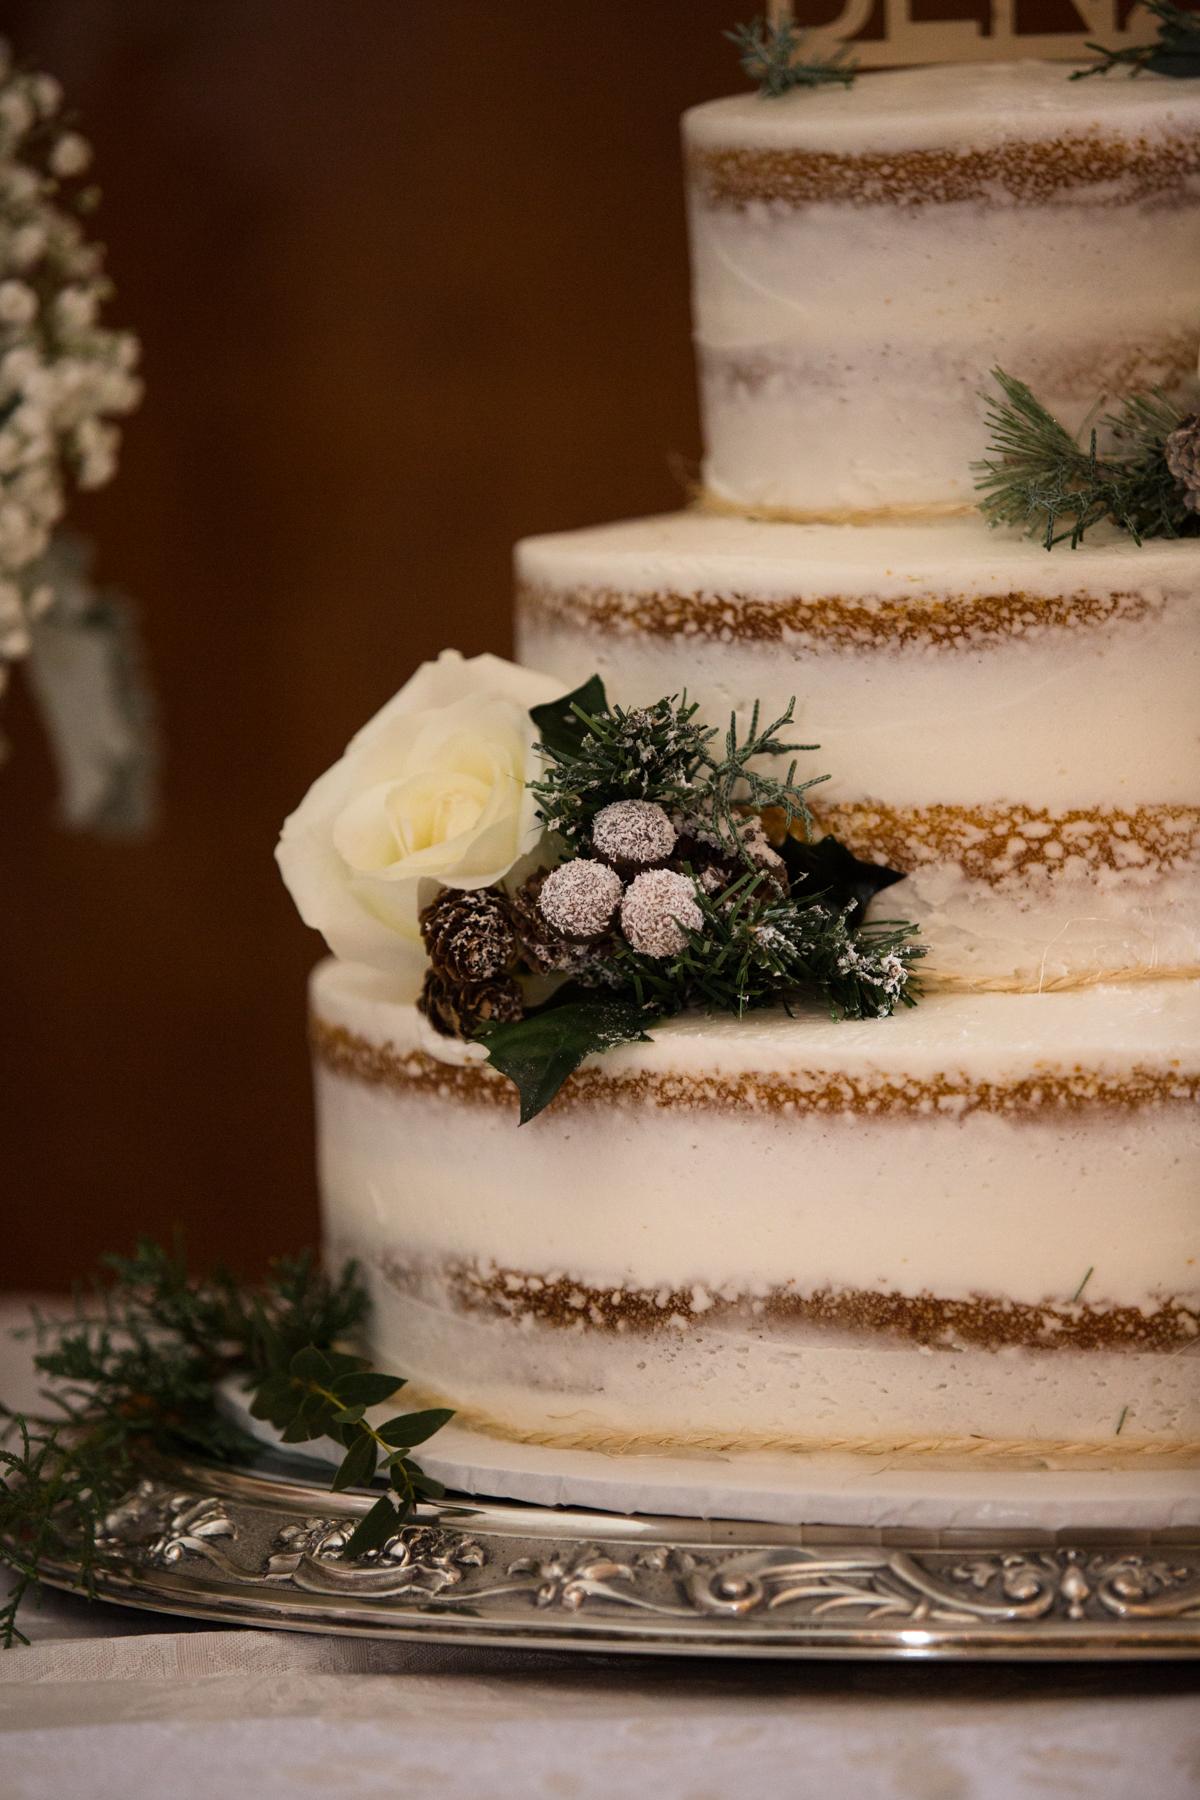 Kelli-and-Matt-Nashville-Wedding-Sneak-Peak-0205.jpg